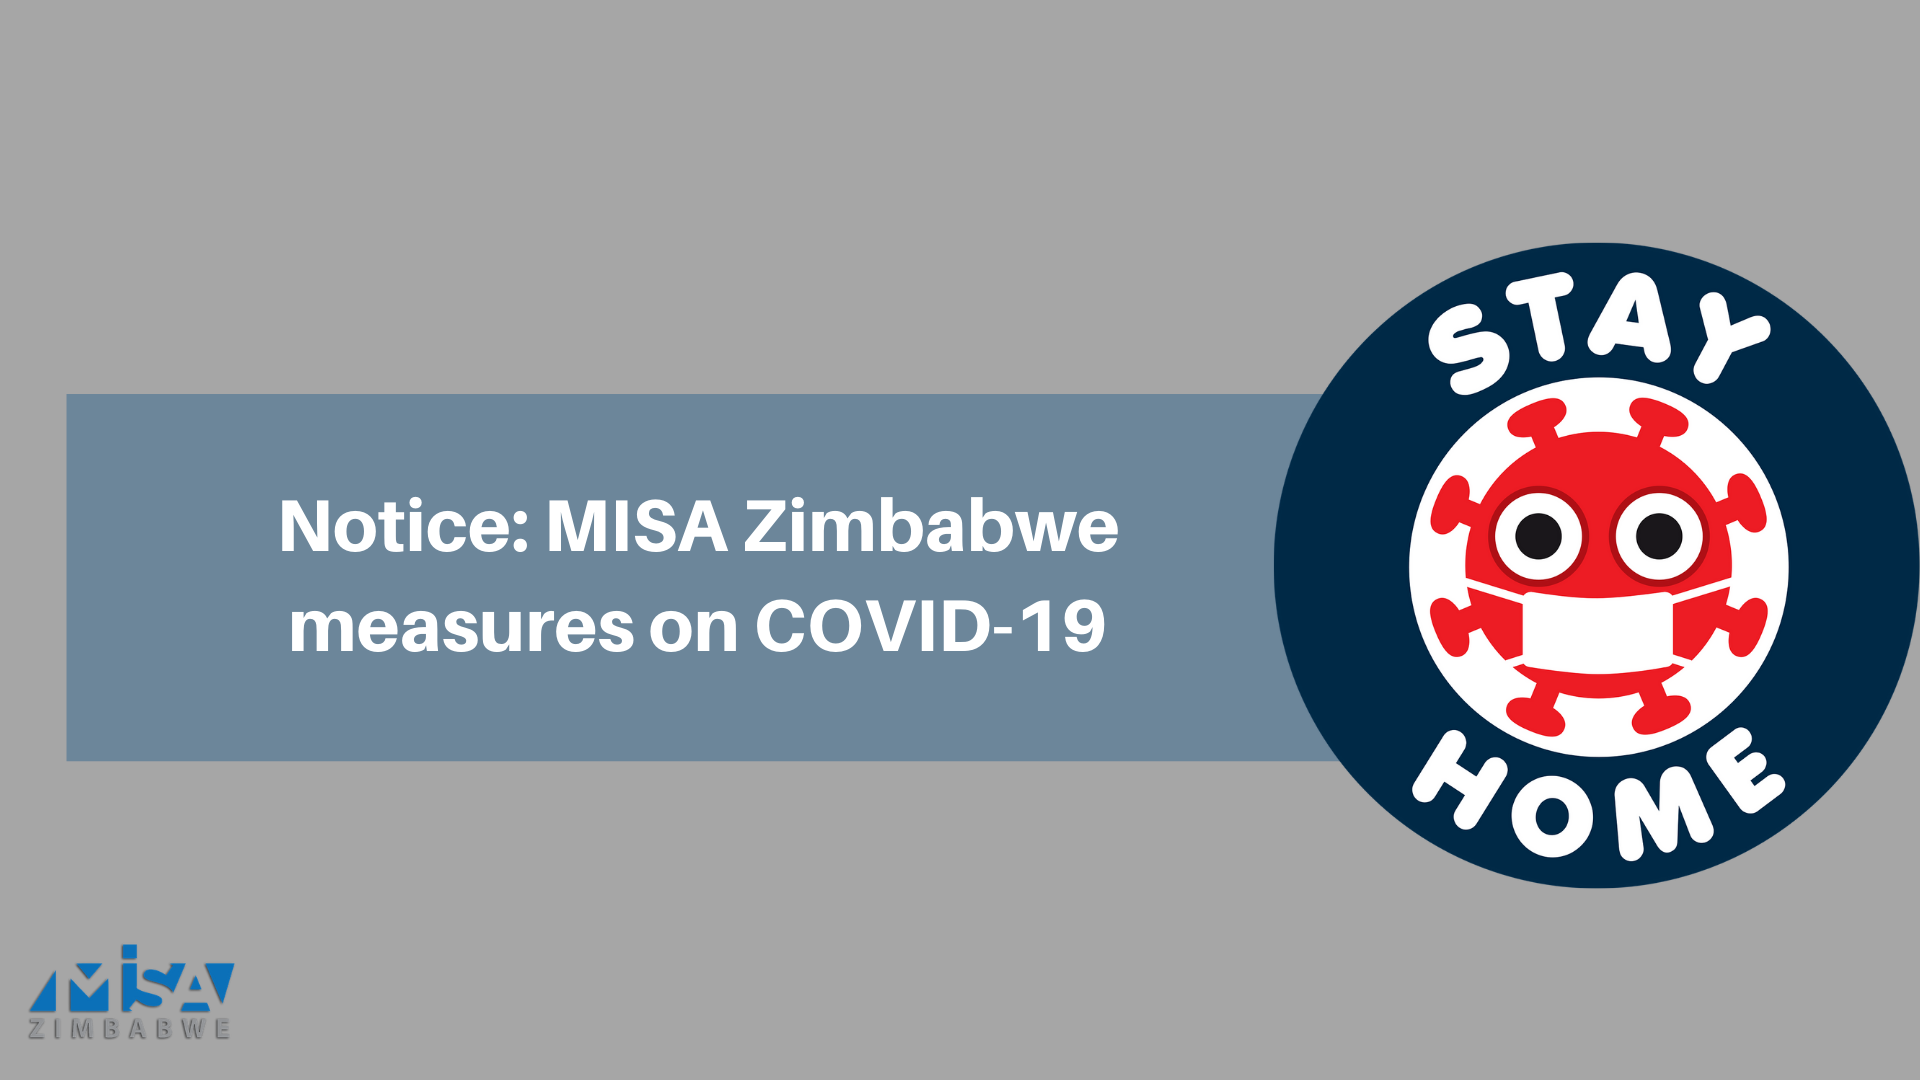 Notice: MISA Zimbabwe measures on COVID-19